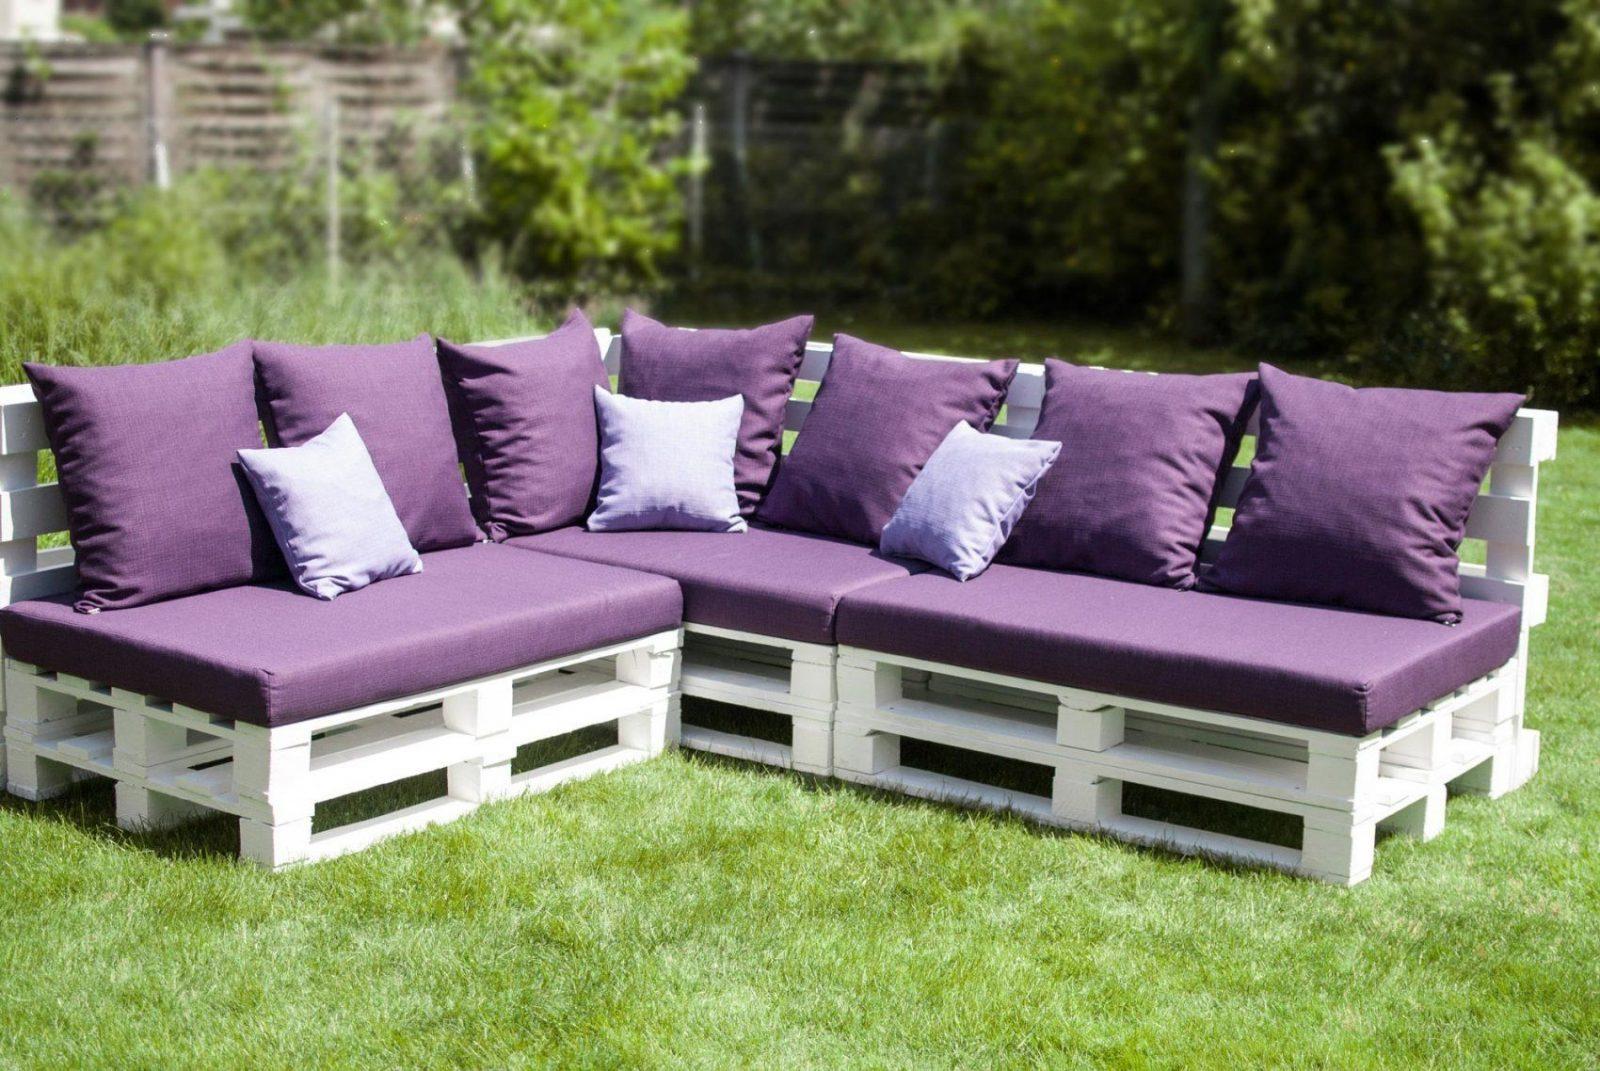 Lounge Möbel Selber Bauen Anleitung Haus Design Ideen